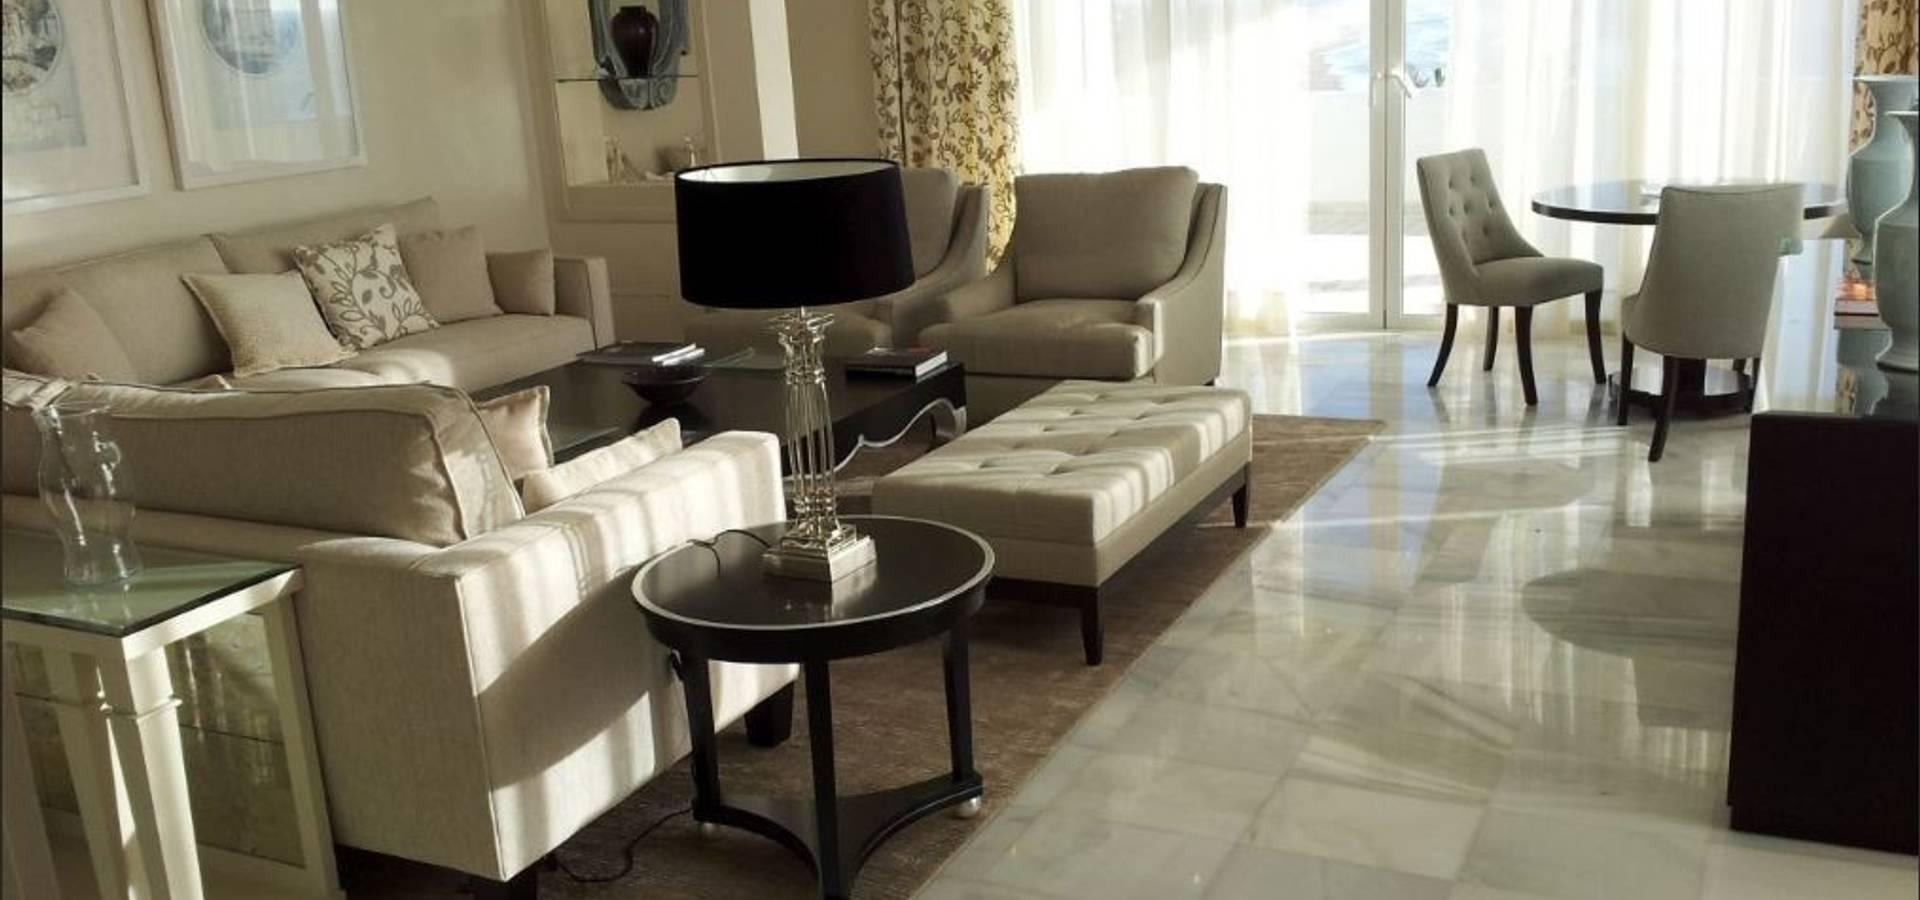 Tapiceria pala decoradores y dise adores de interiores en - Disenadores de interiores madrid ...